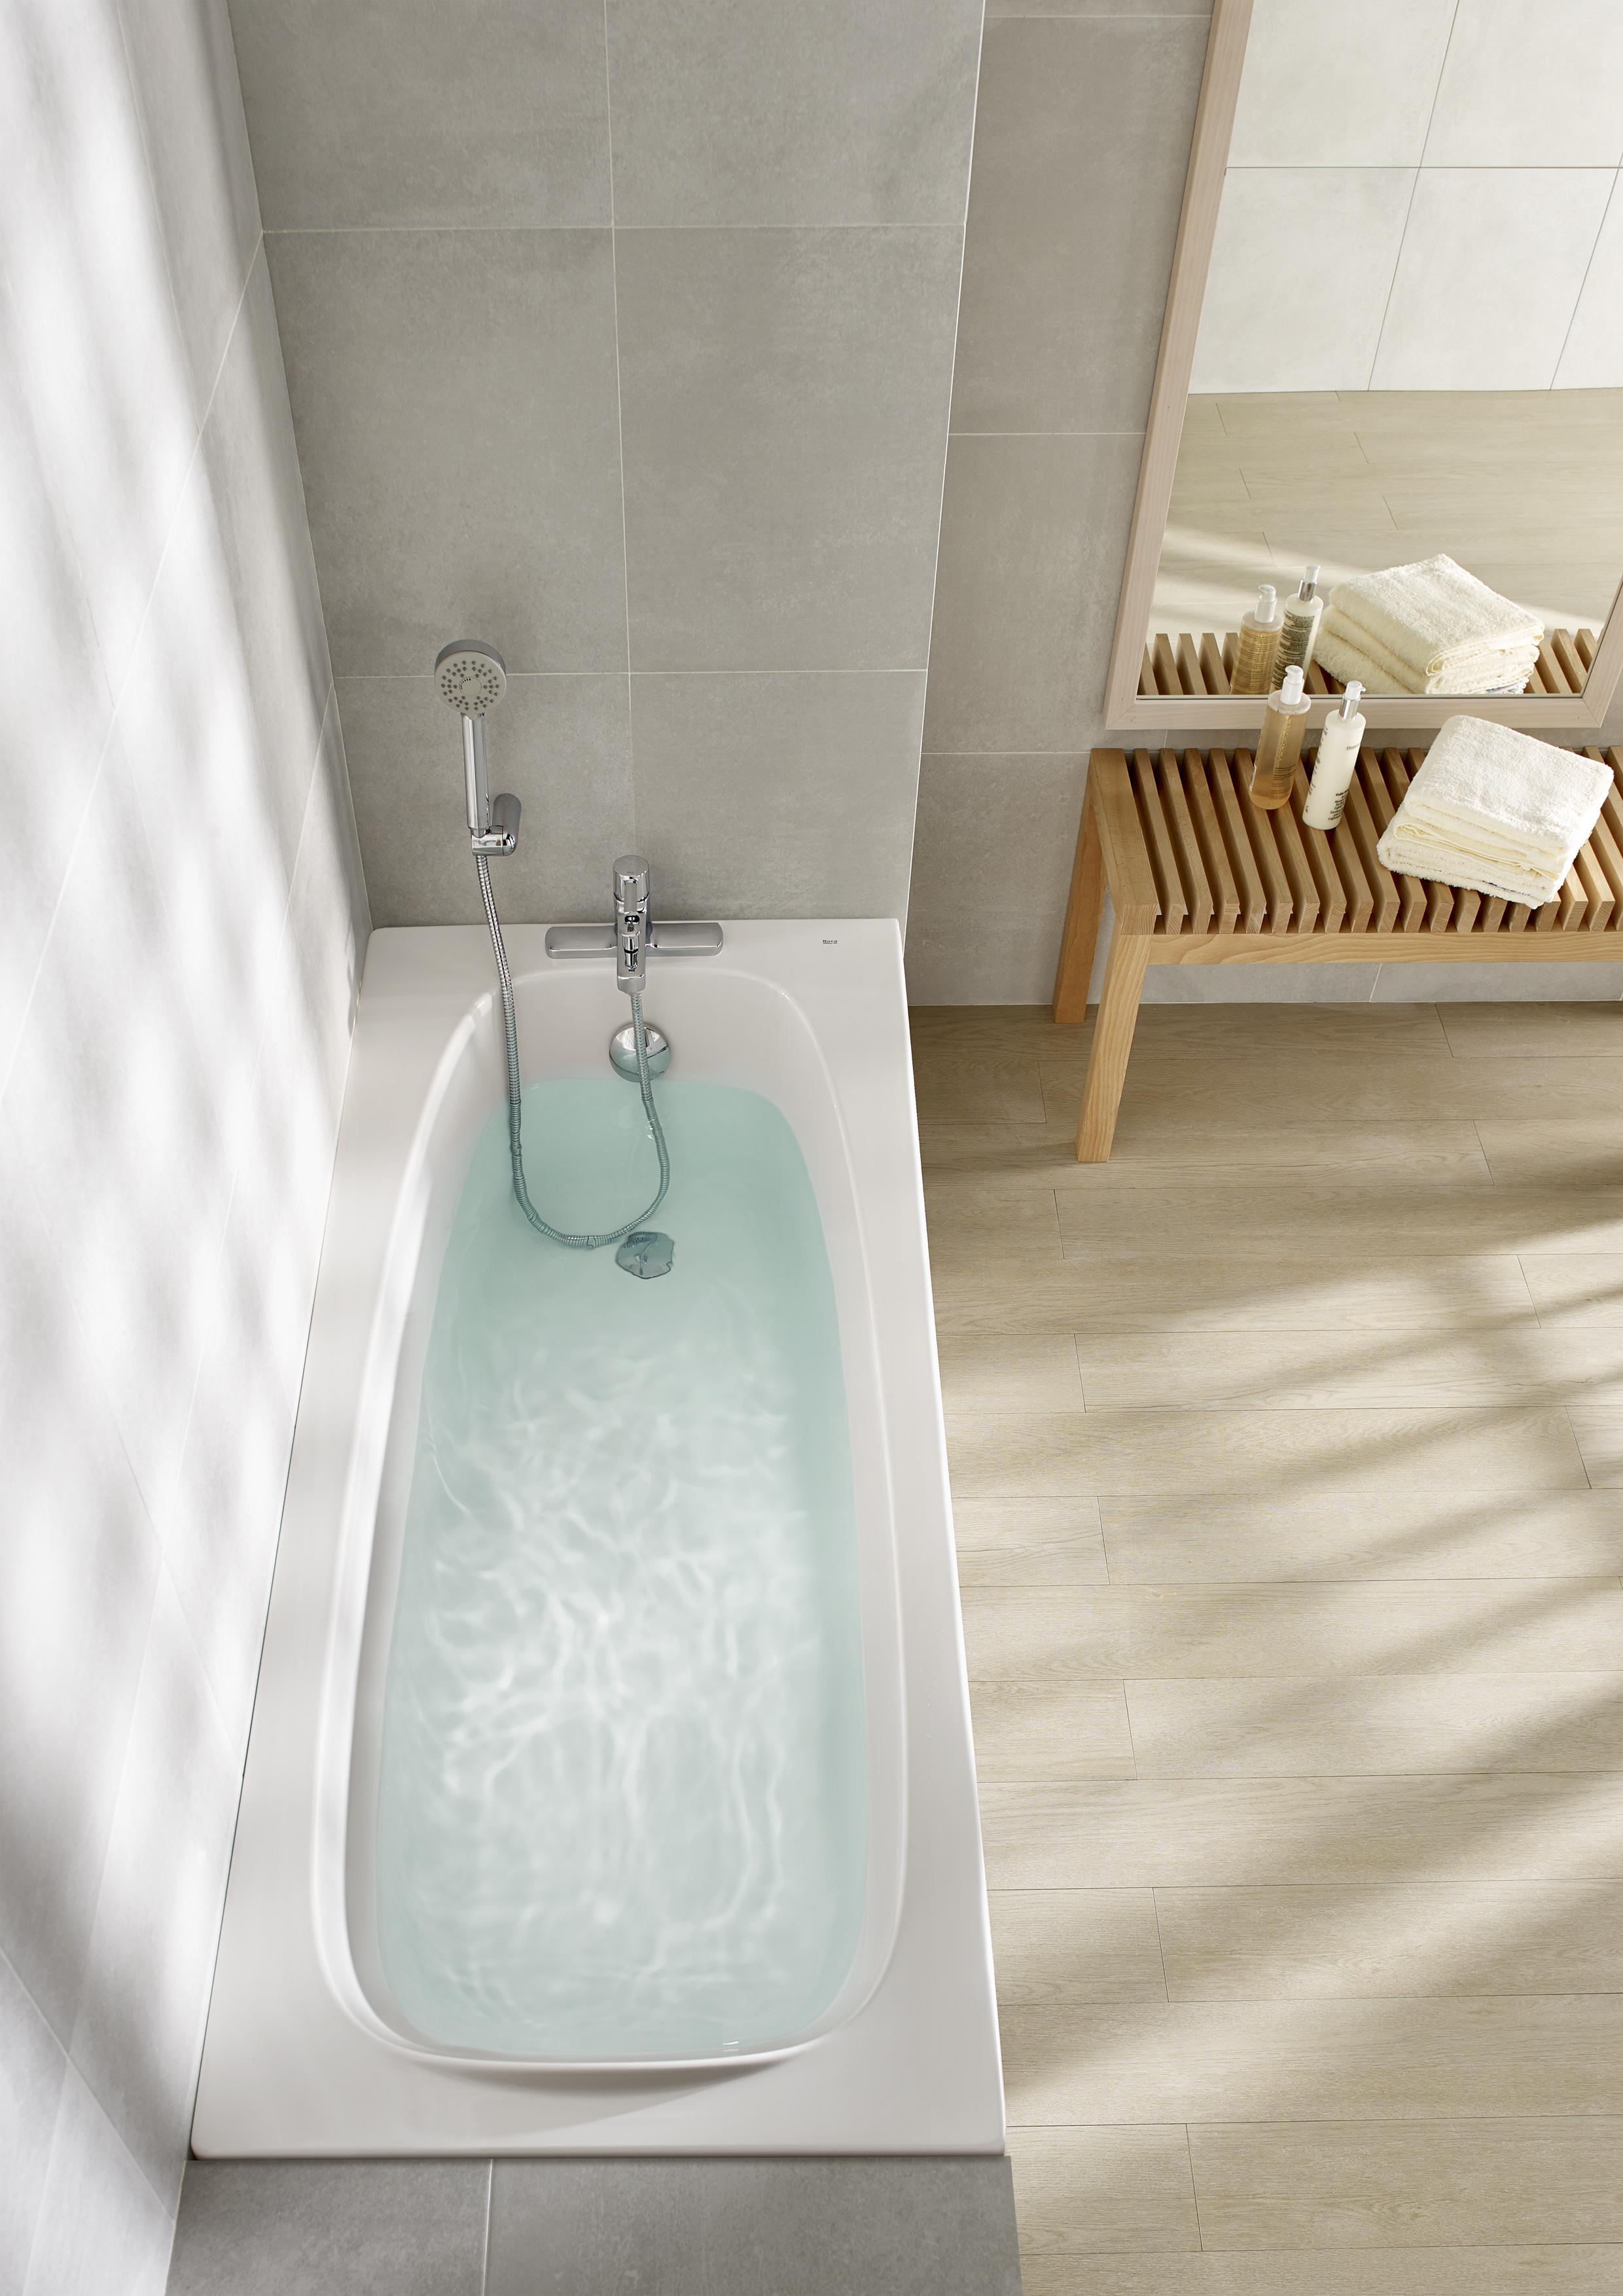 Roca has launched new Malaga acrylic bathtub - Installer ...